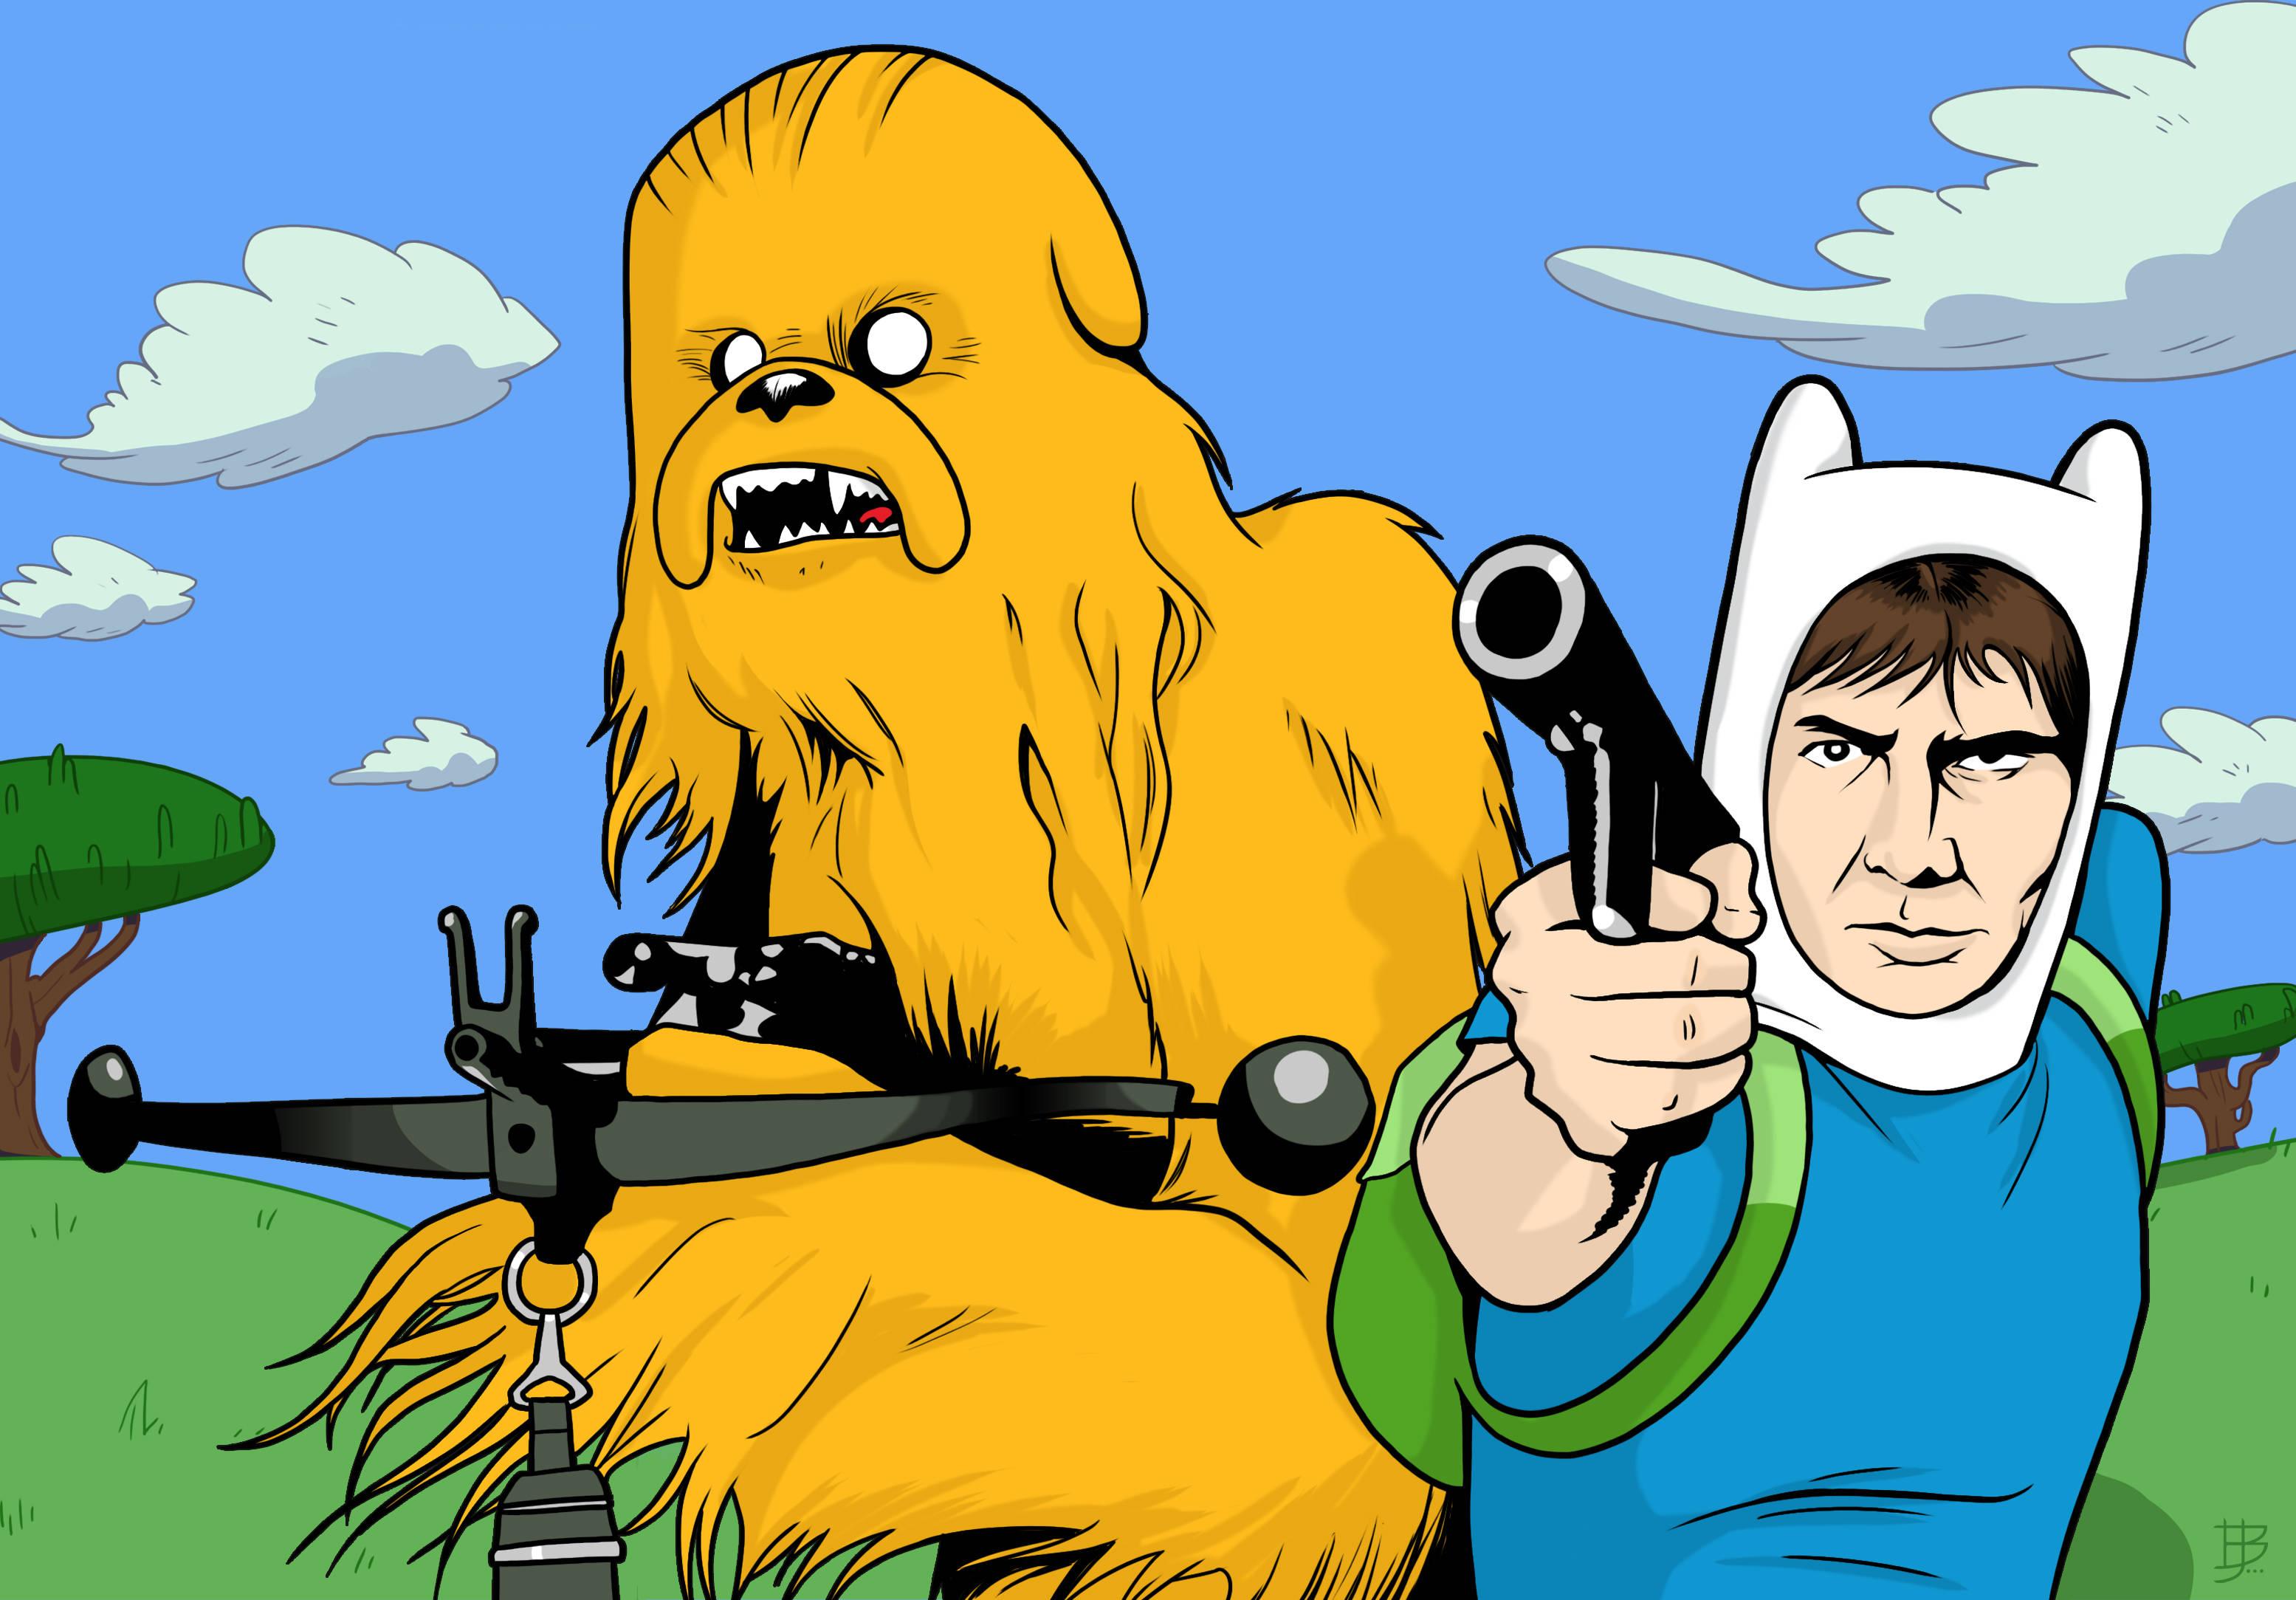 When Star Wars Meets Adventure Time [3110x2167] iimgurcom 3110x2167